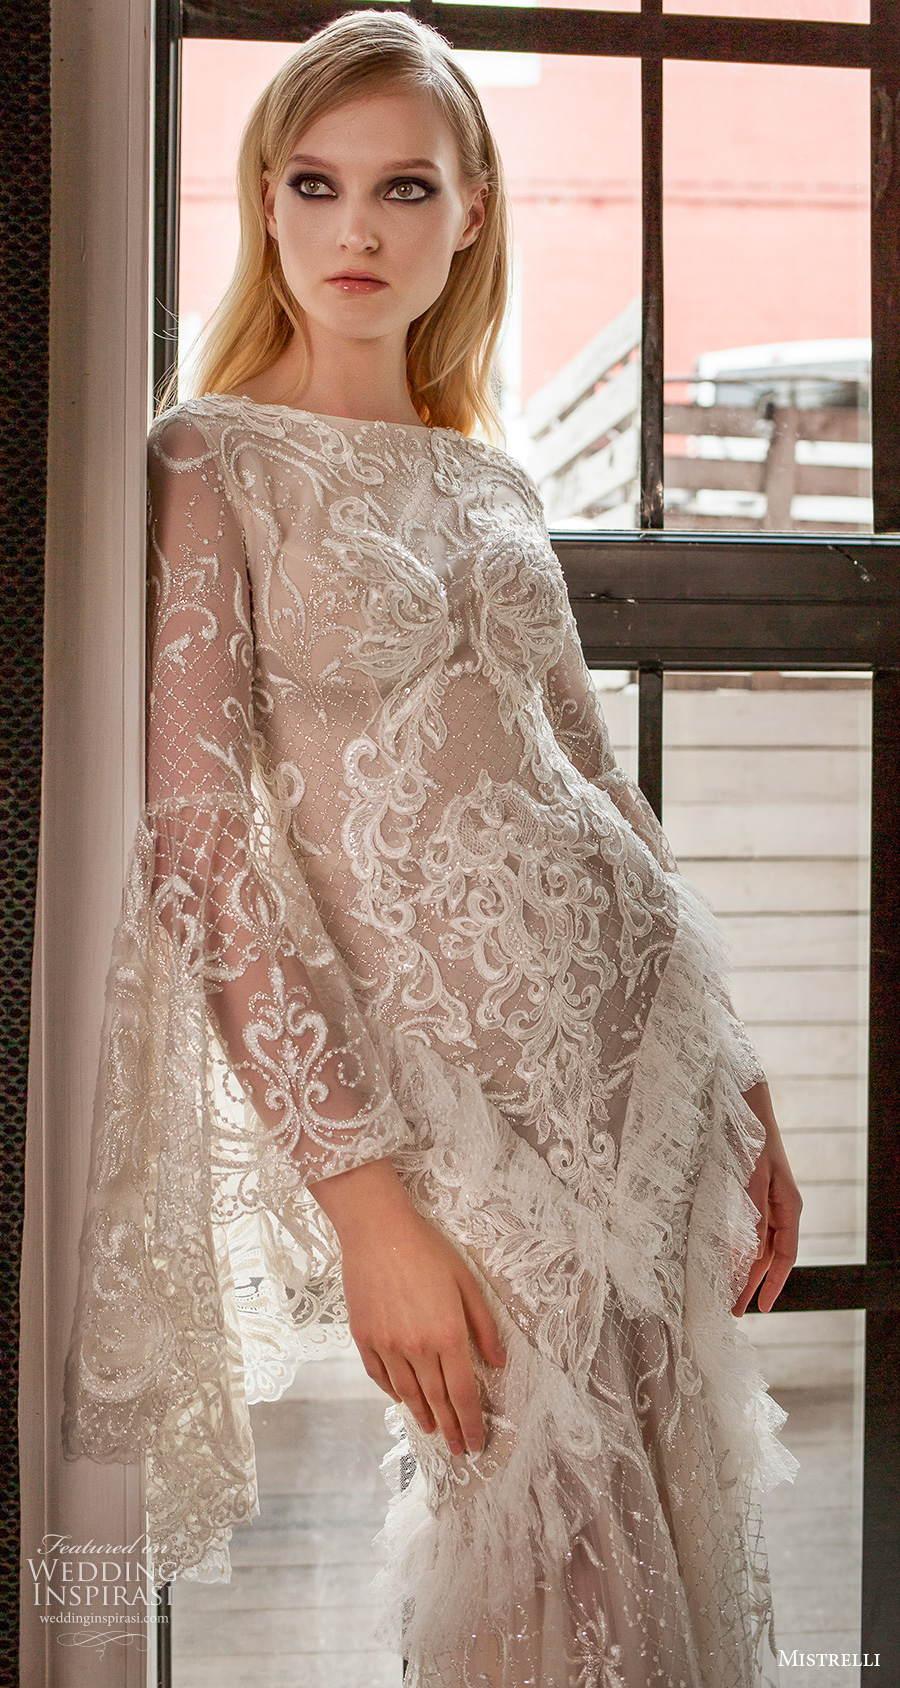 mistrelli 2021 royal drama bridal long bell sleeves bateau neck full embellishment elegant mermaid wedding dress sheer lace back chapel train (10) zv